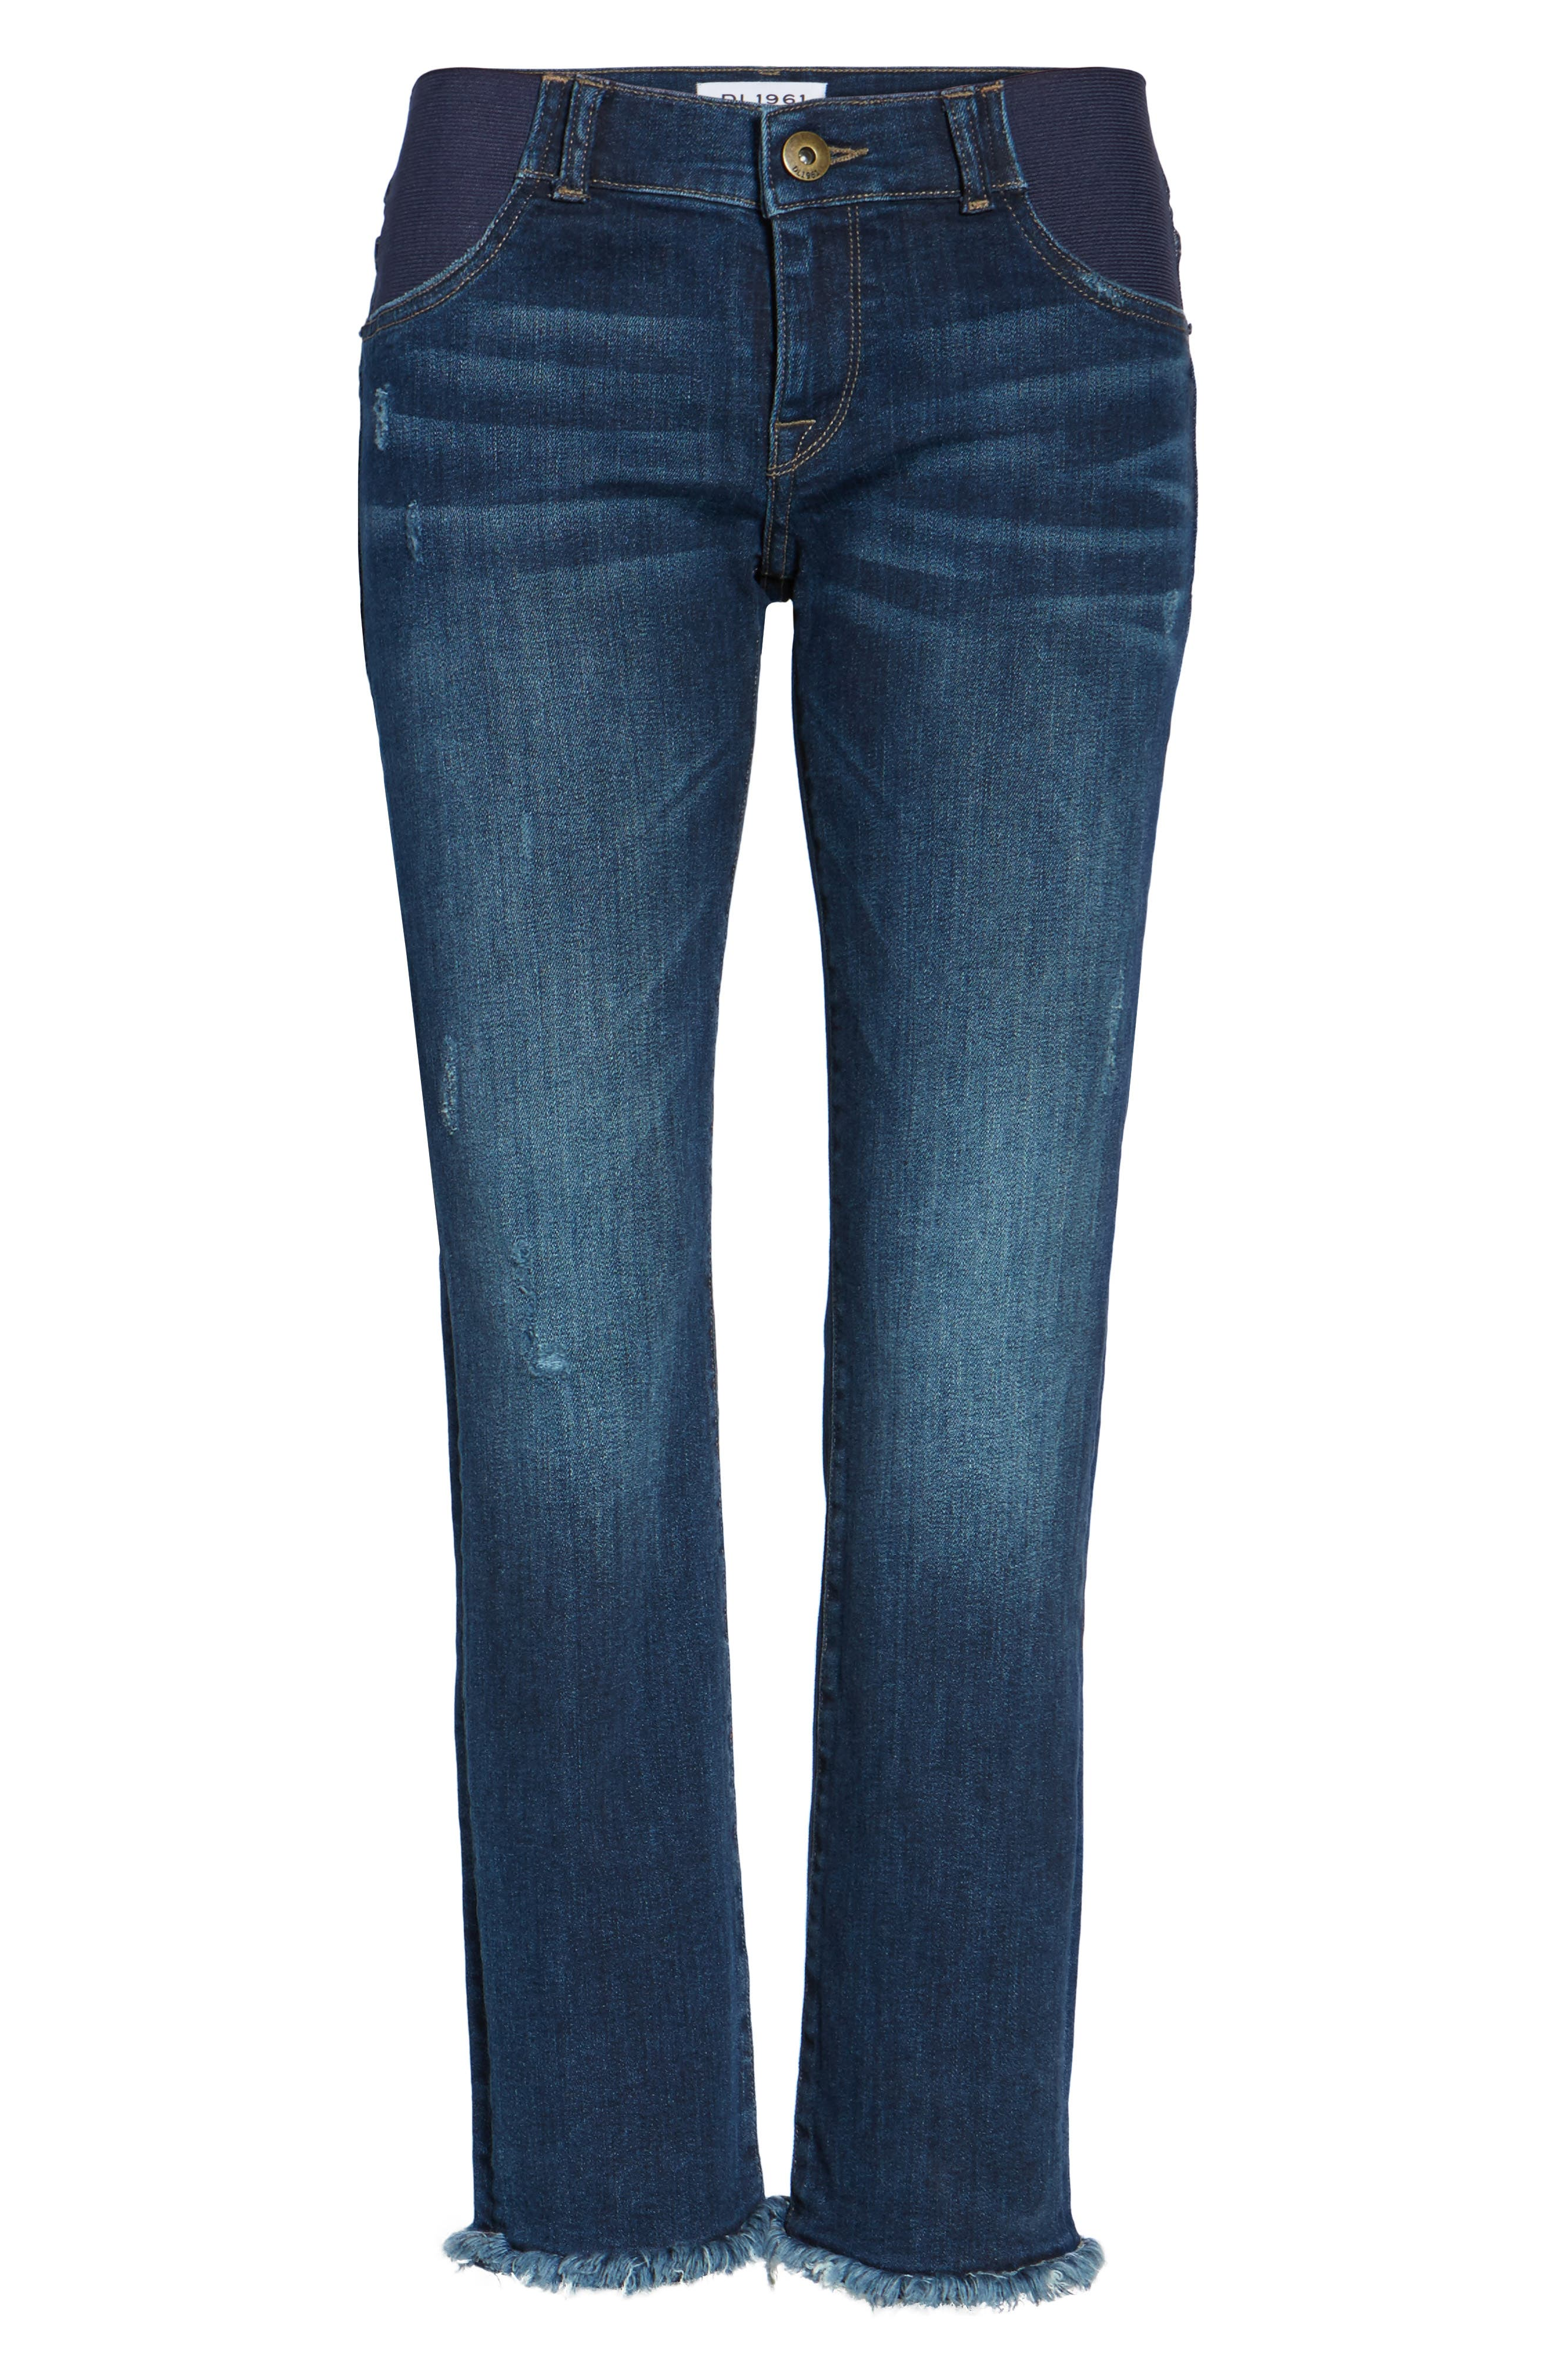 Mara Maternity Ankle Jeans,                             Alternate thumbnail 6, color,                             405